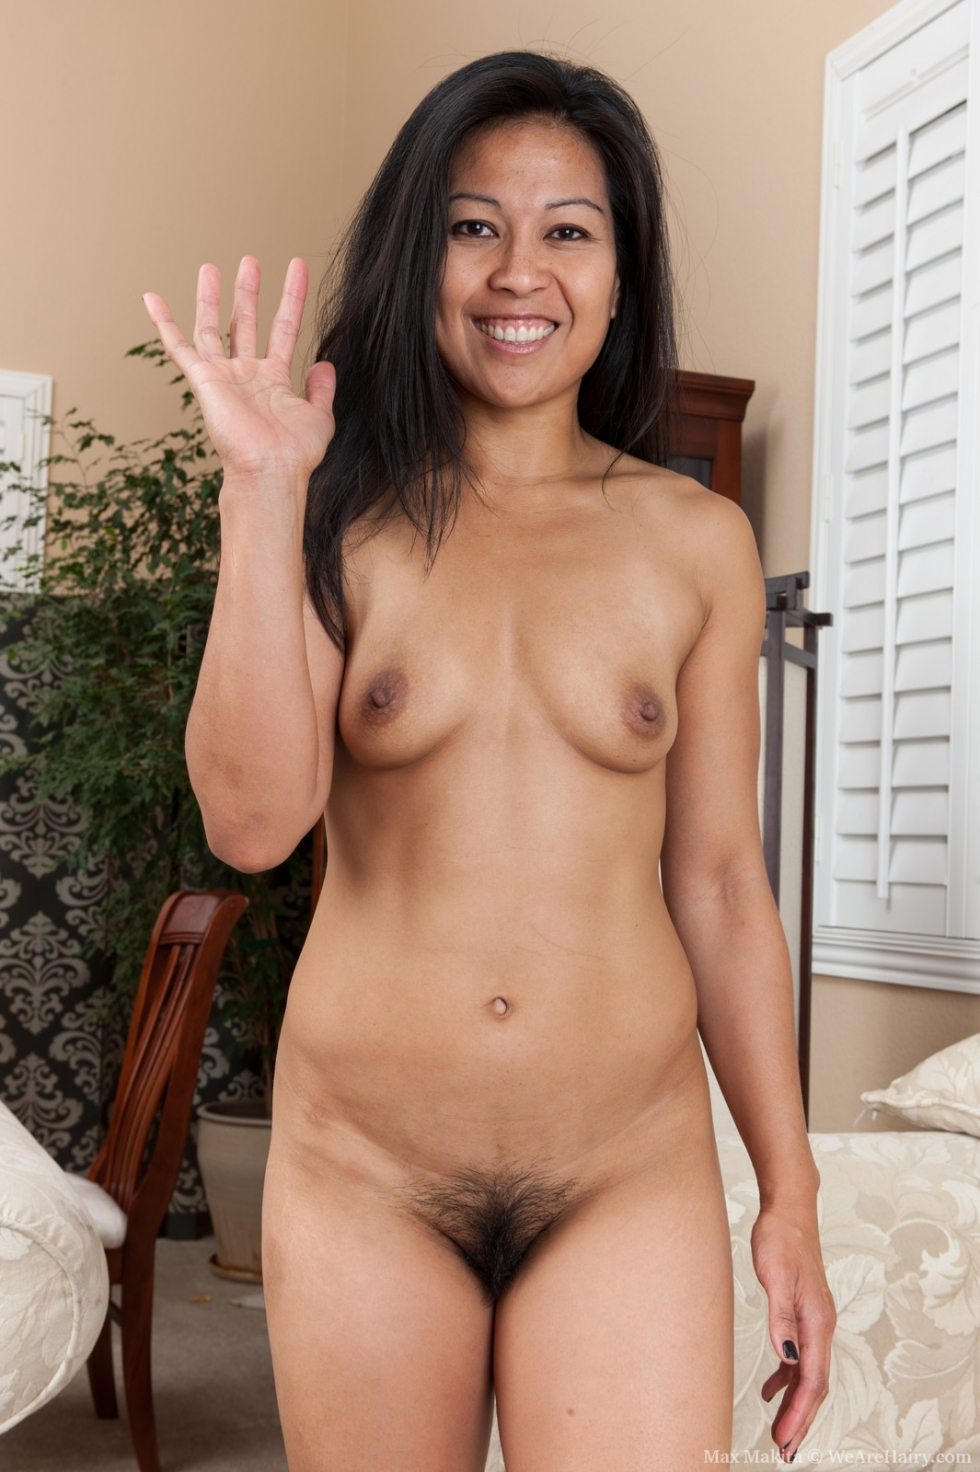 Big boobs orgy